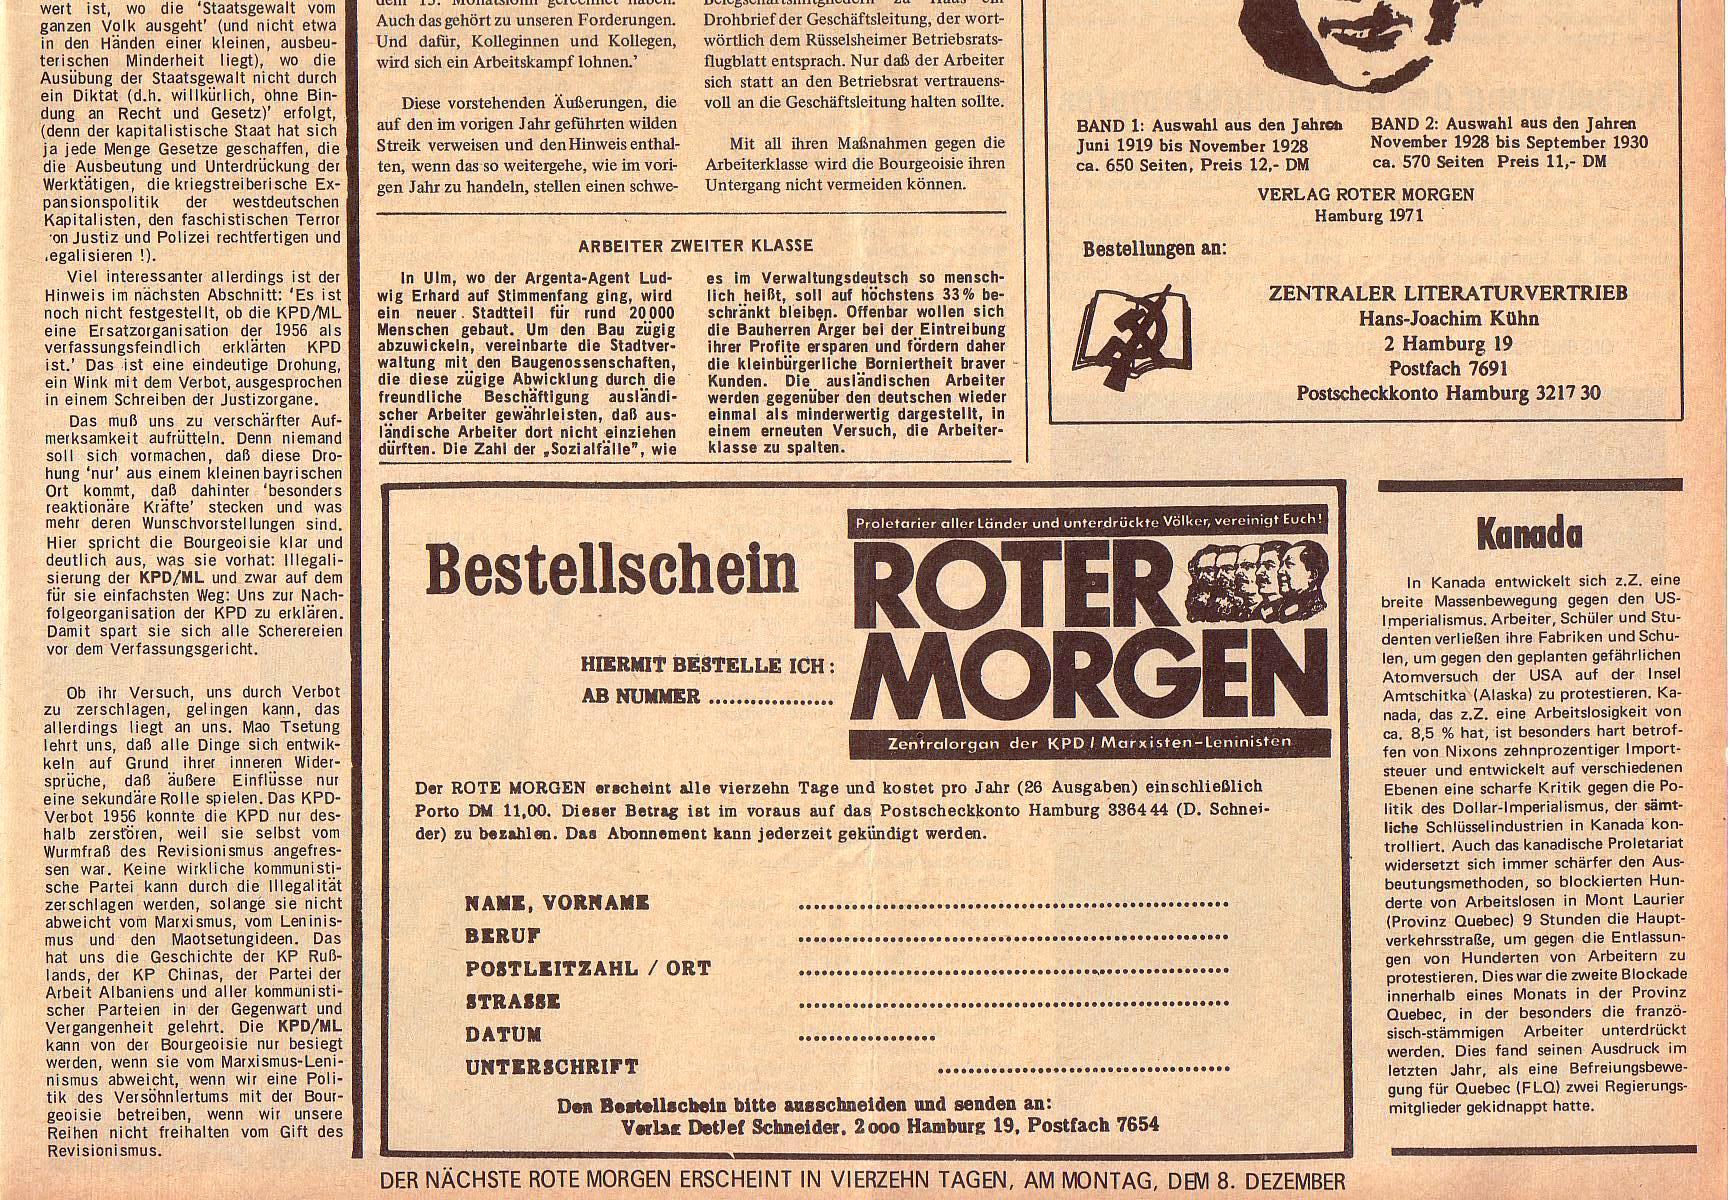 Roter Morgen, 5. Jg., 22. November 1971, Nr. 14, Seite 7b